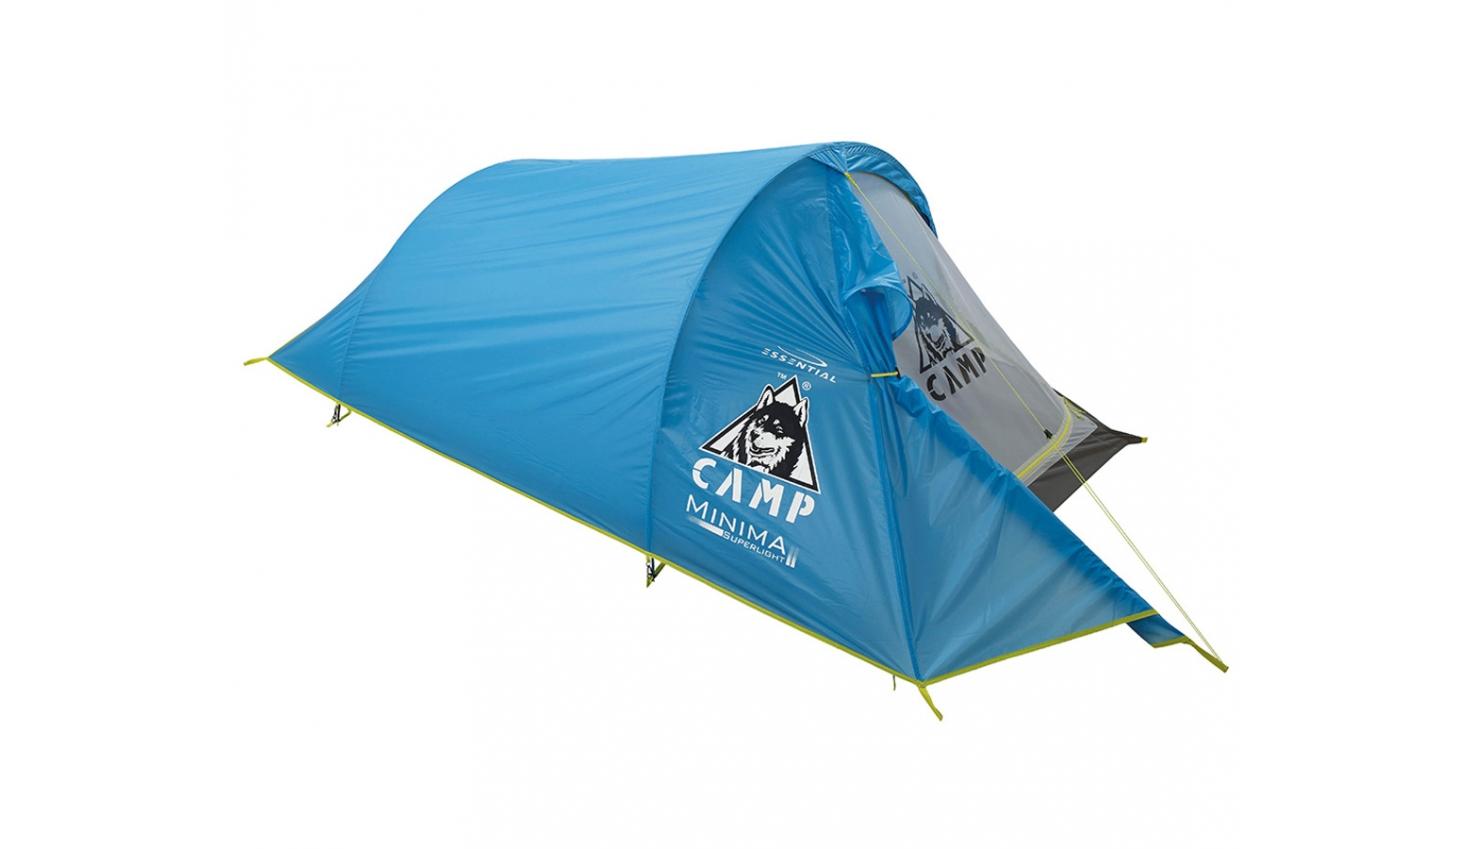 Camp_Minima_2y_SL_Tent[1470x849]